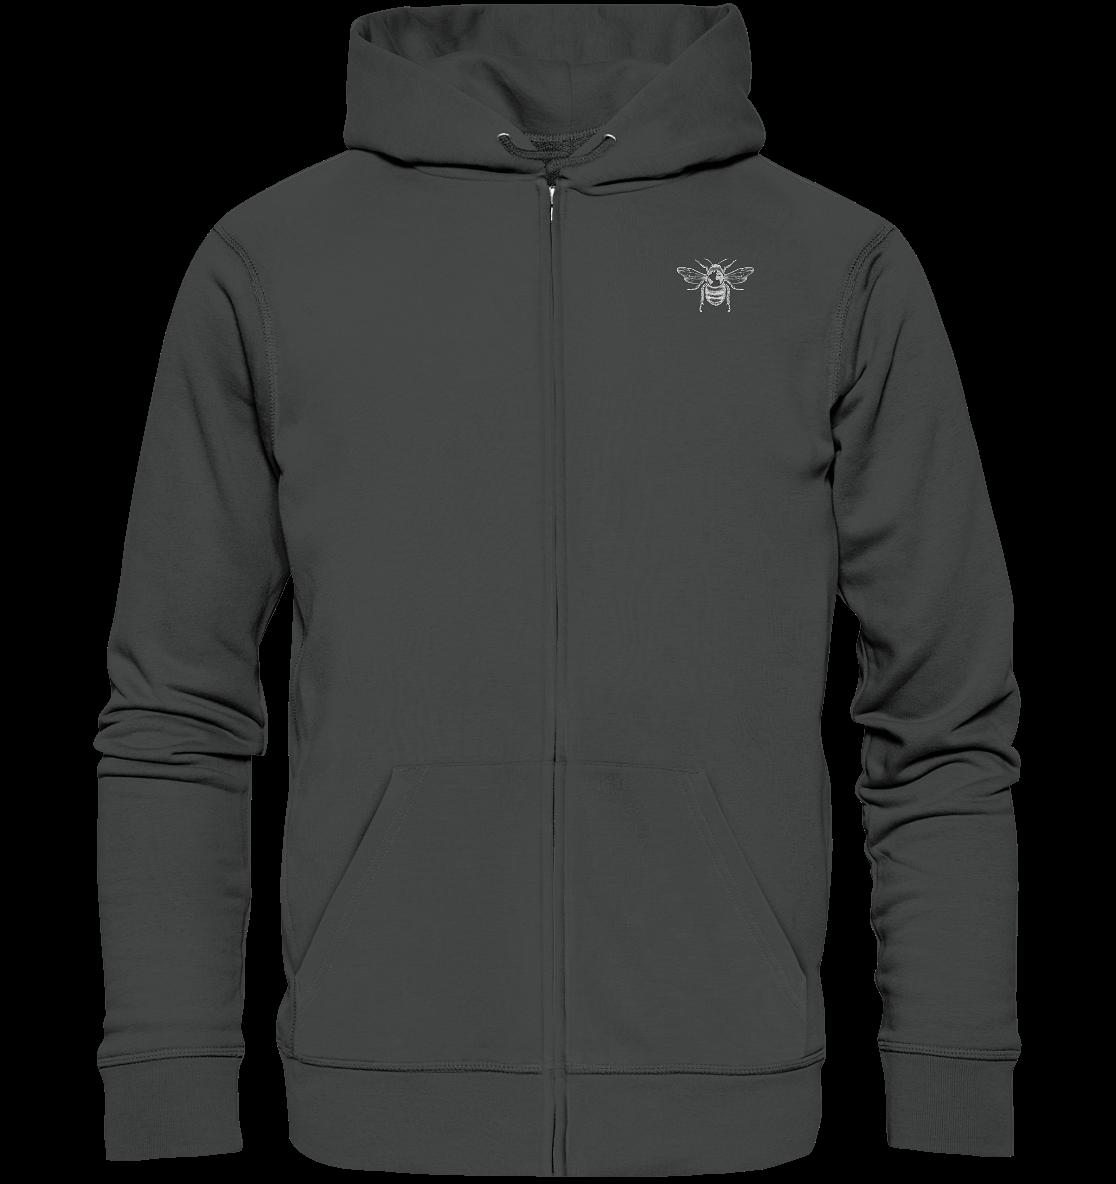 front-organic-zipper-444545-1116x.png